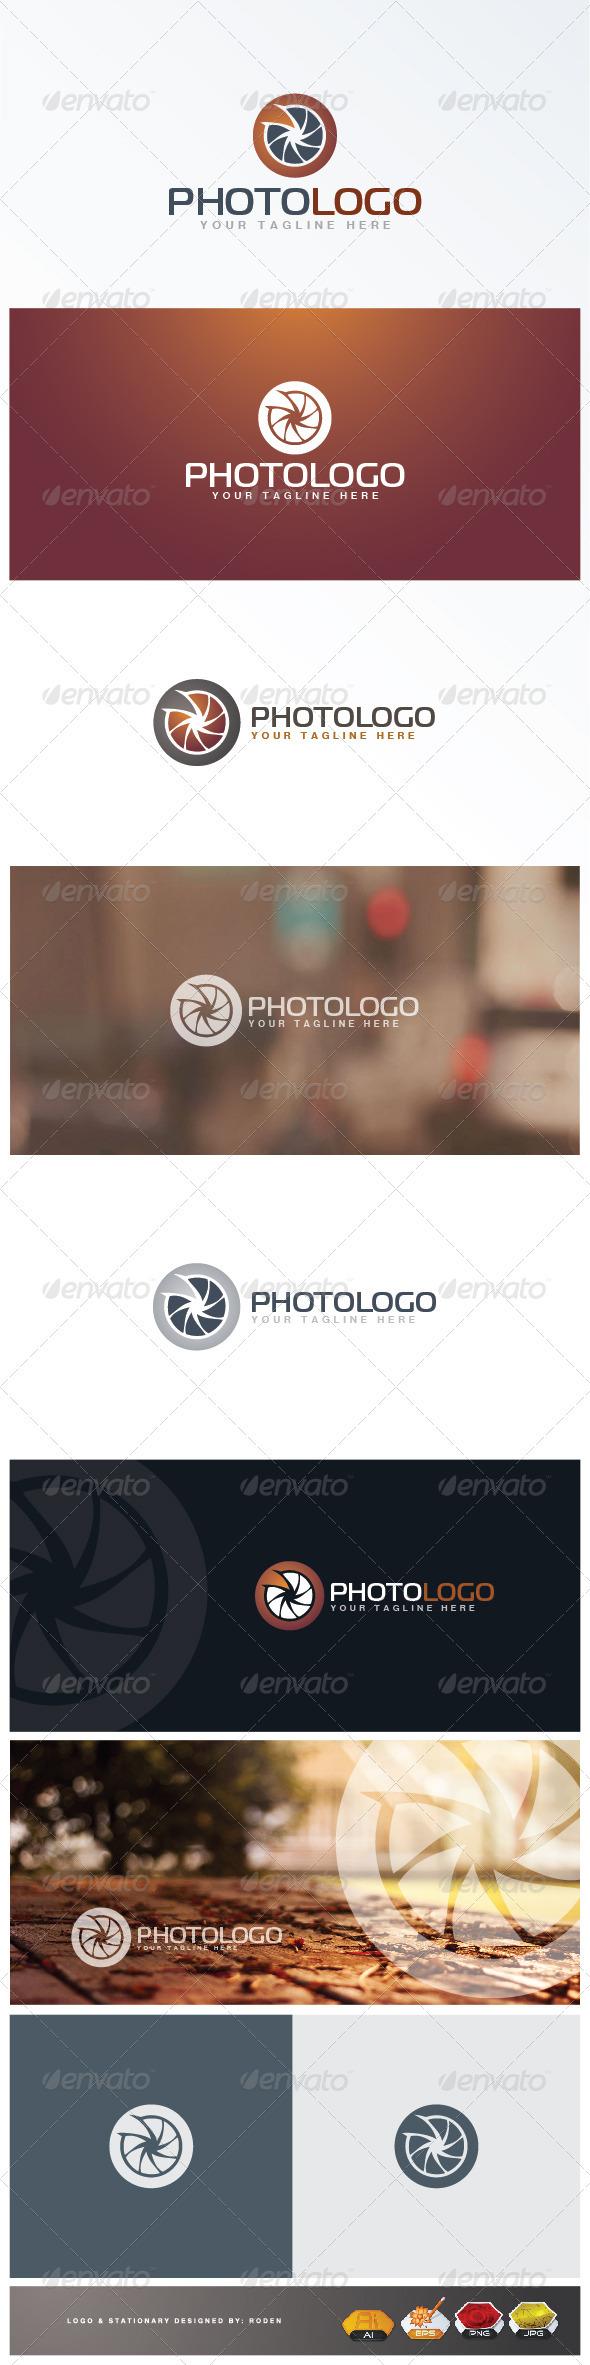 GraphicRiver Photo studio logo 3347204